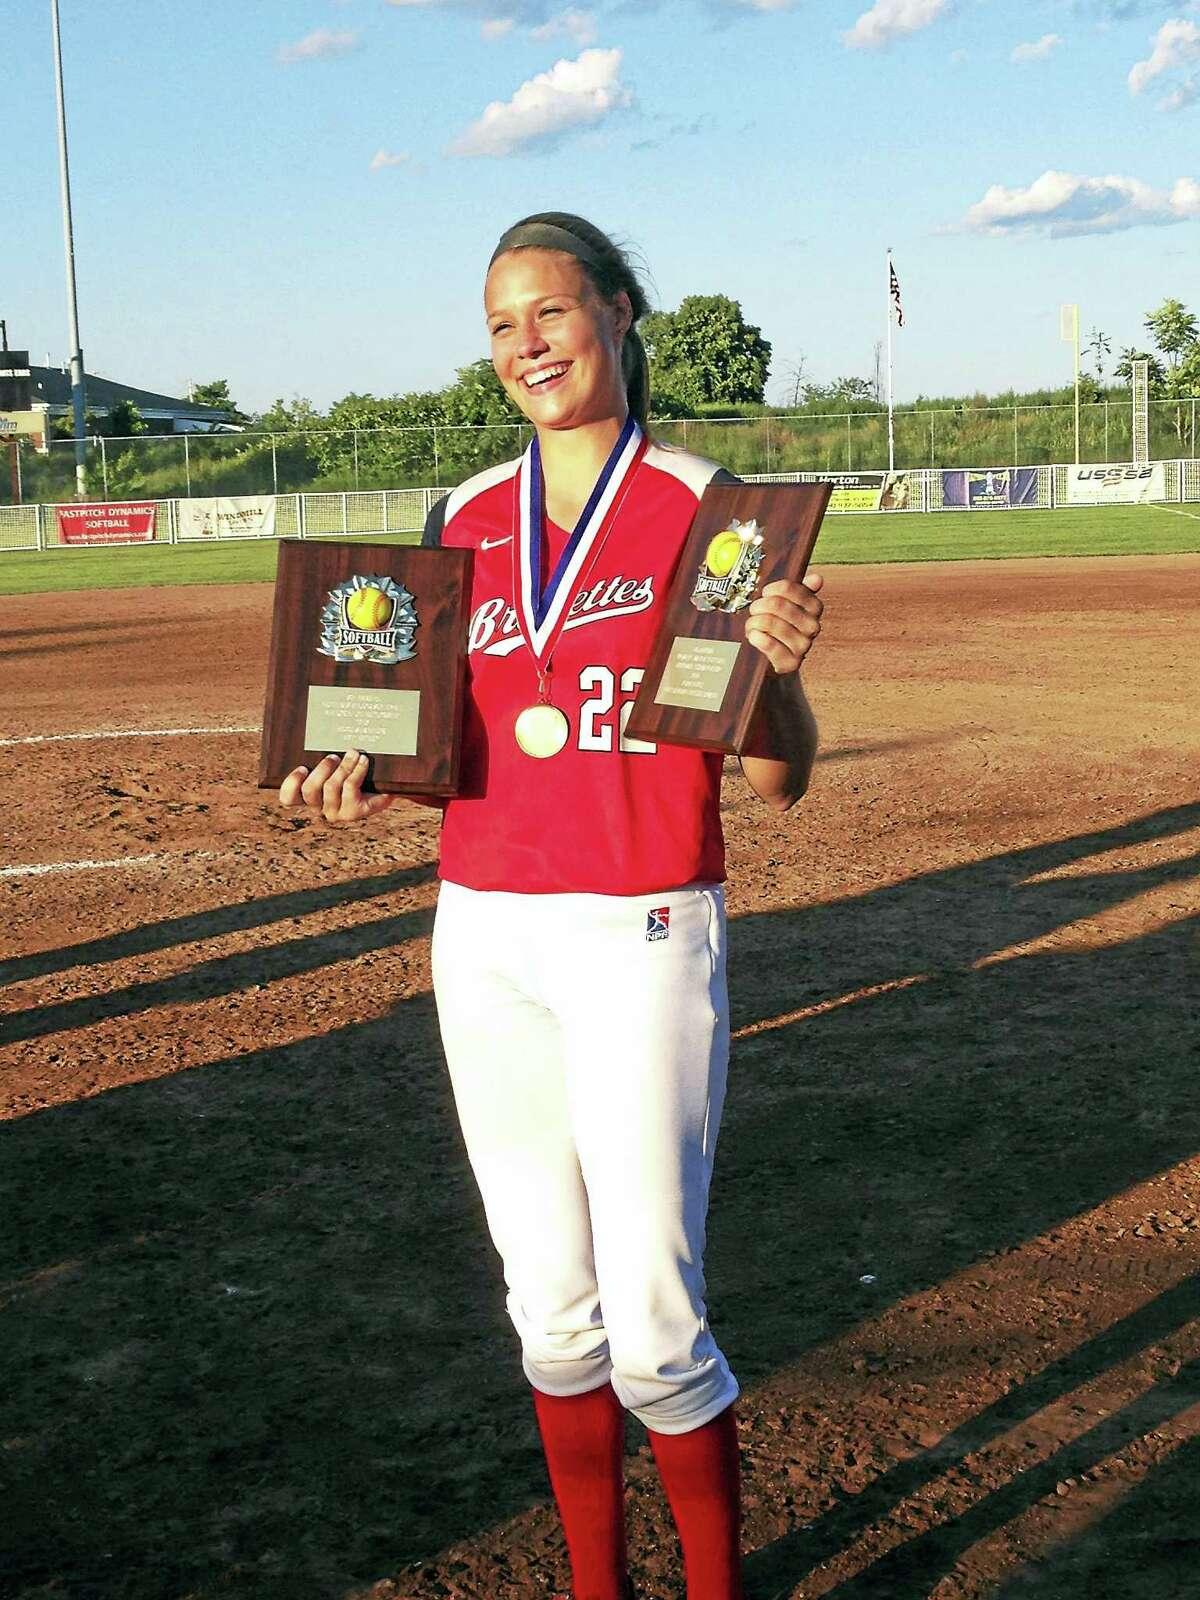 Brakettes pitcher Megan Good was named the MVP of the Women's Major Softball National Championship tournament.